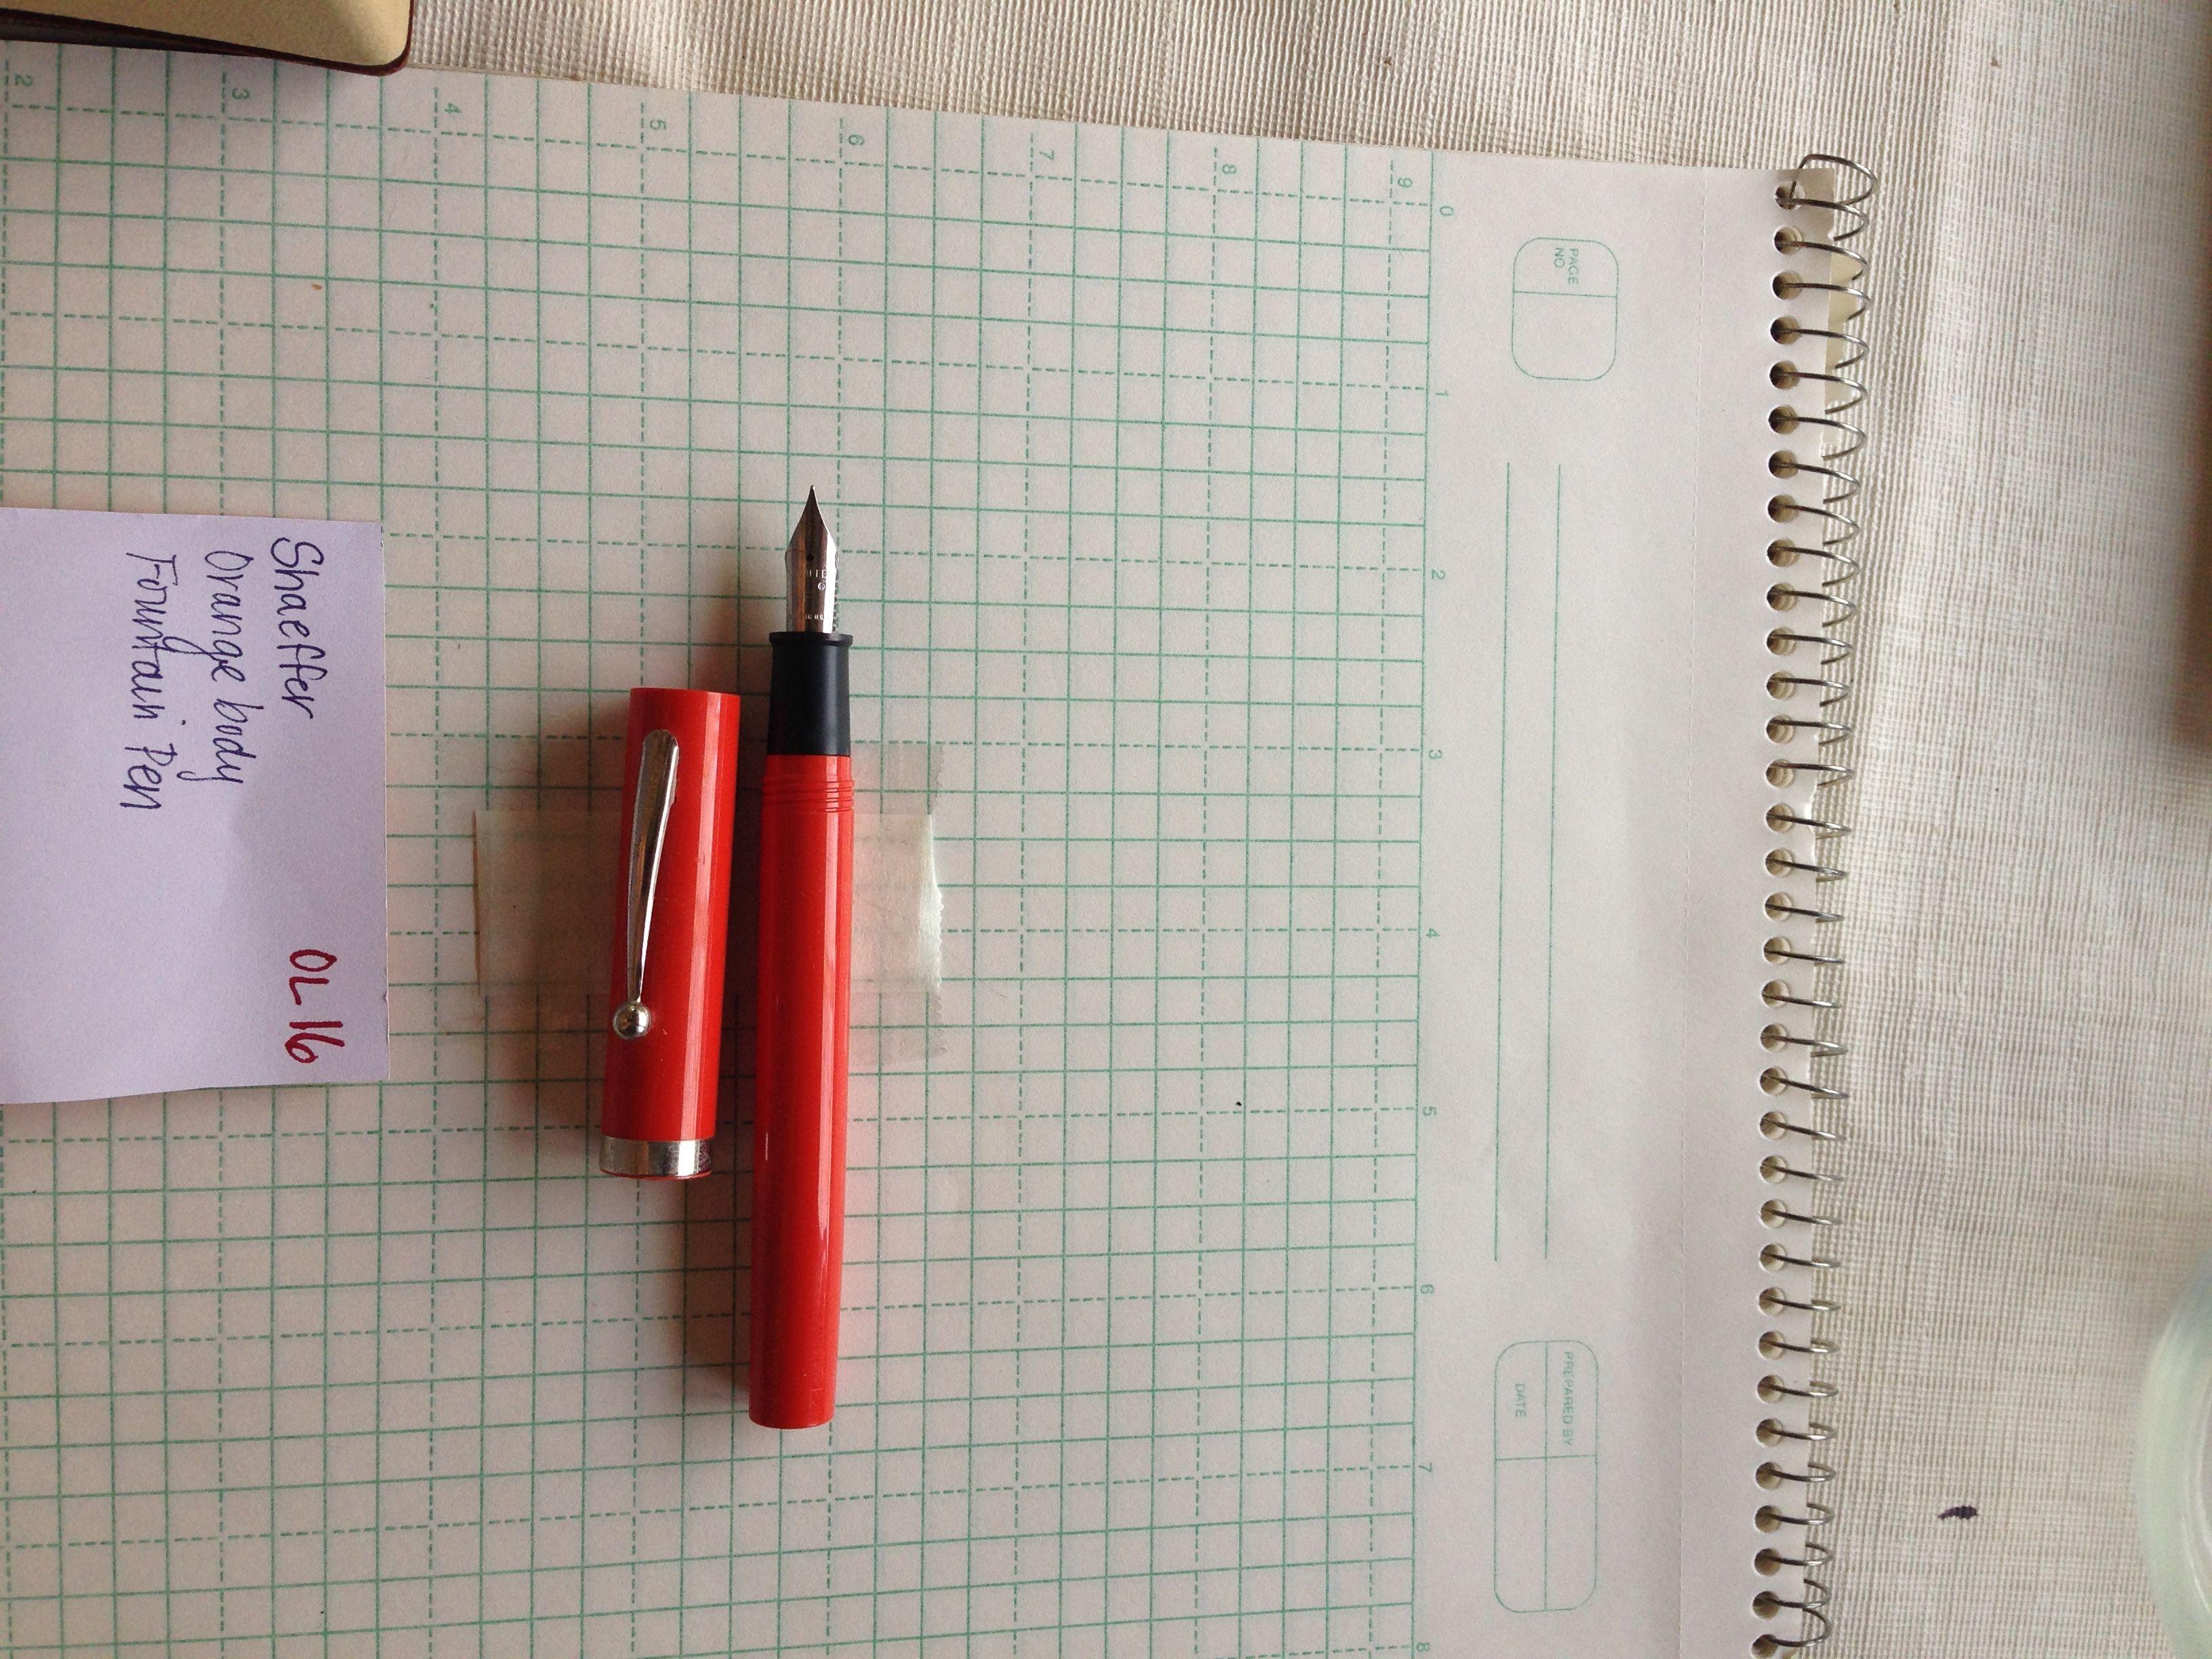 dating sheaffer fountain pens